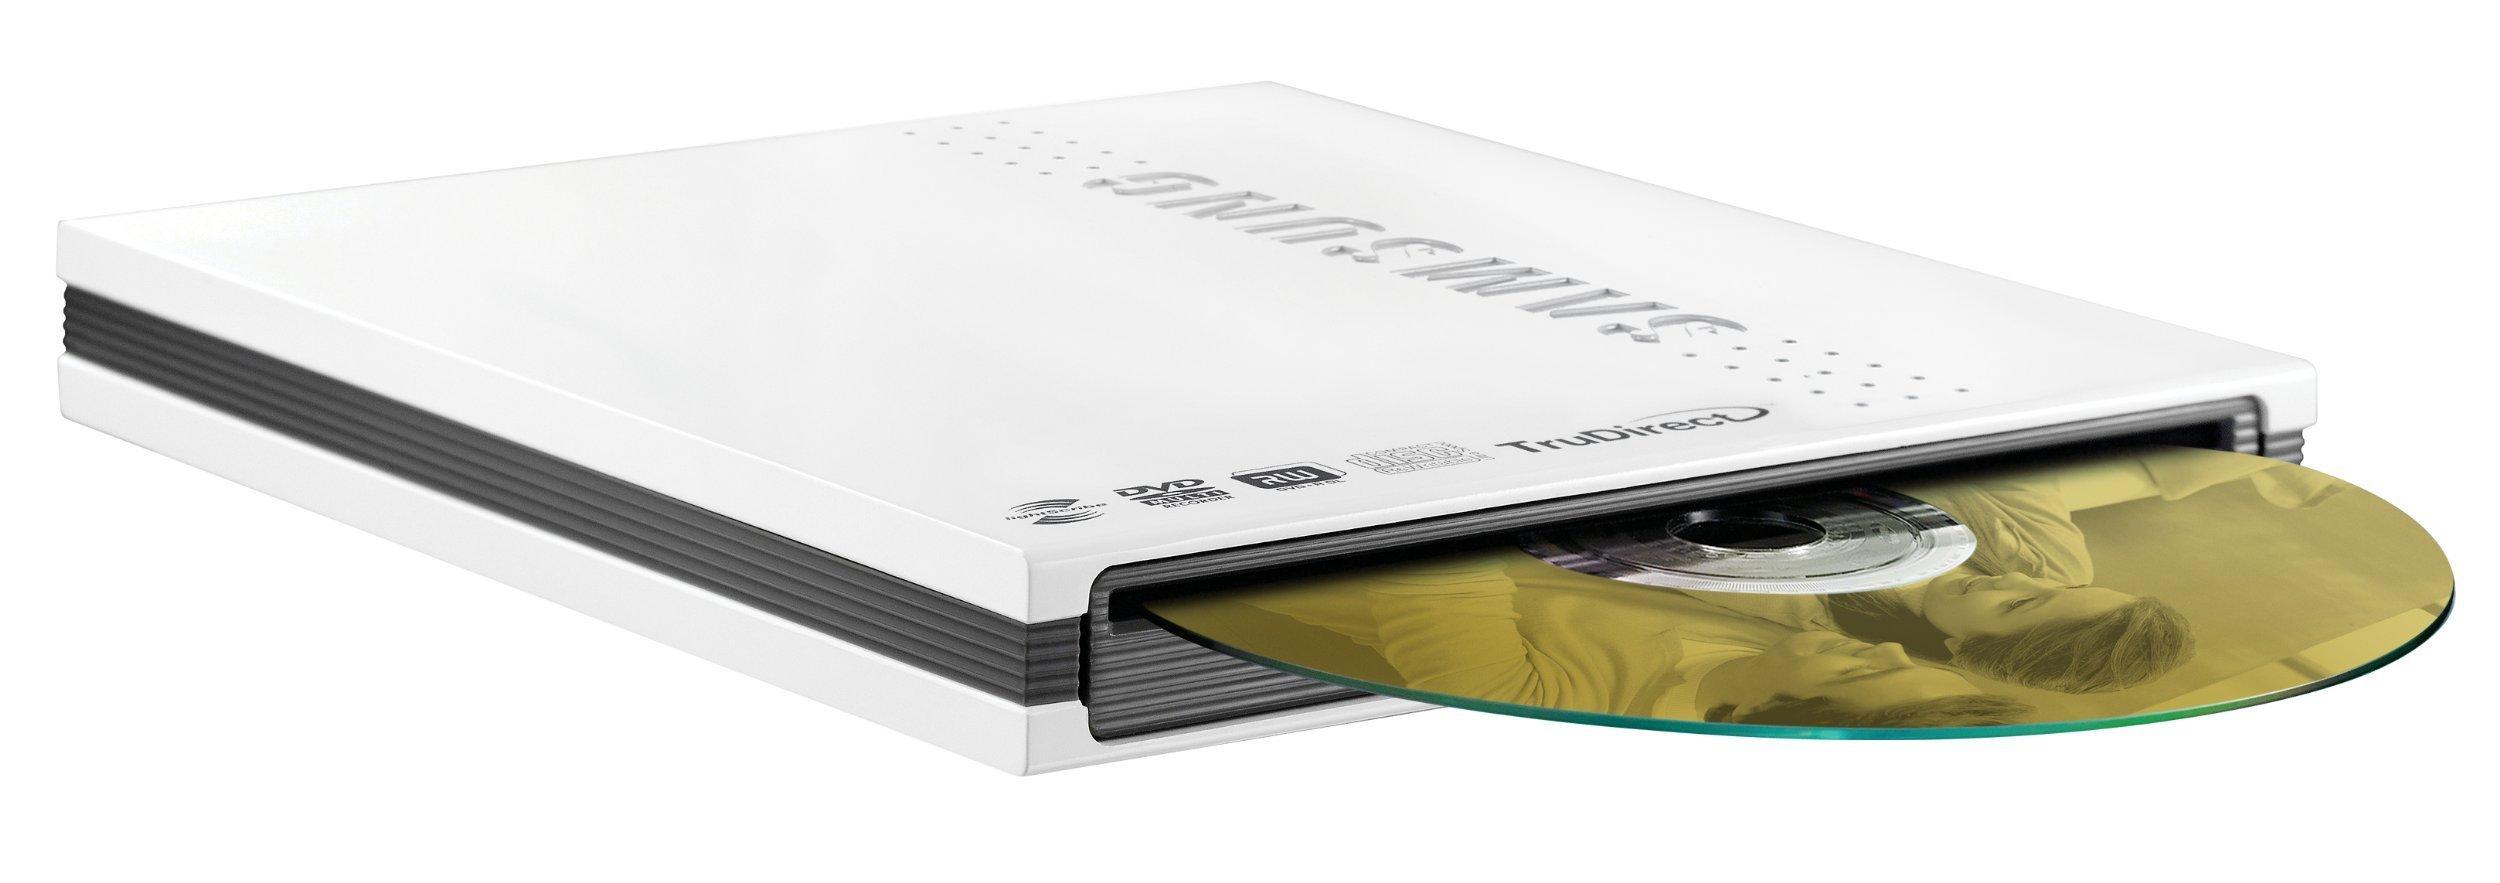 Samsung SE-T084M/RSWD External Slim Slot Load USB Lightscribe DVD Writer (White)